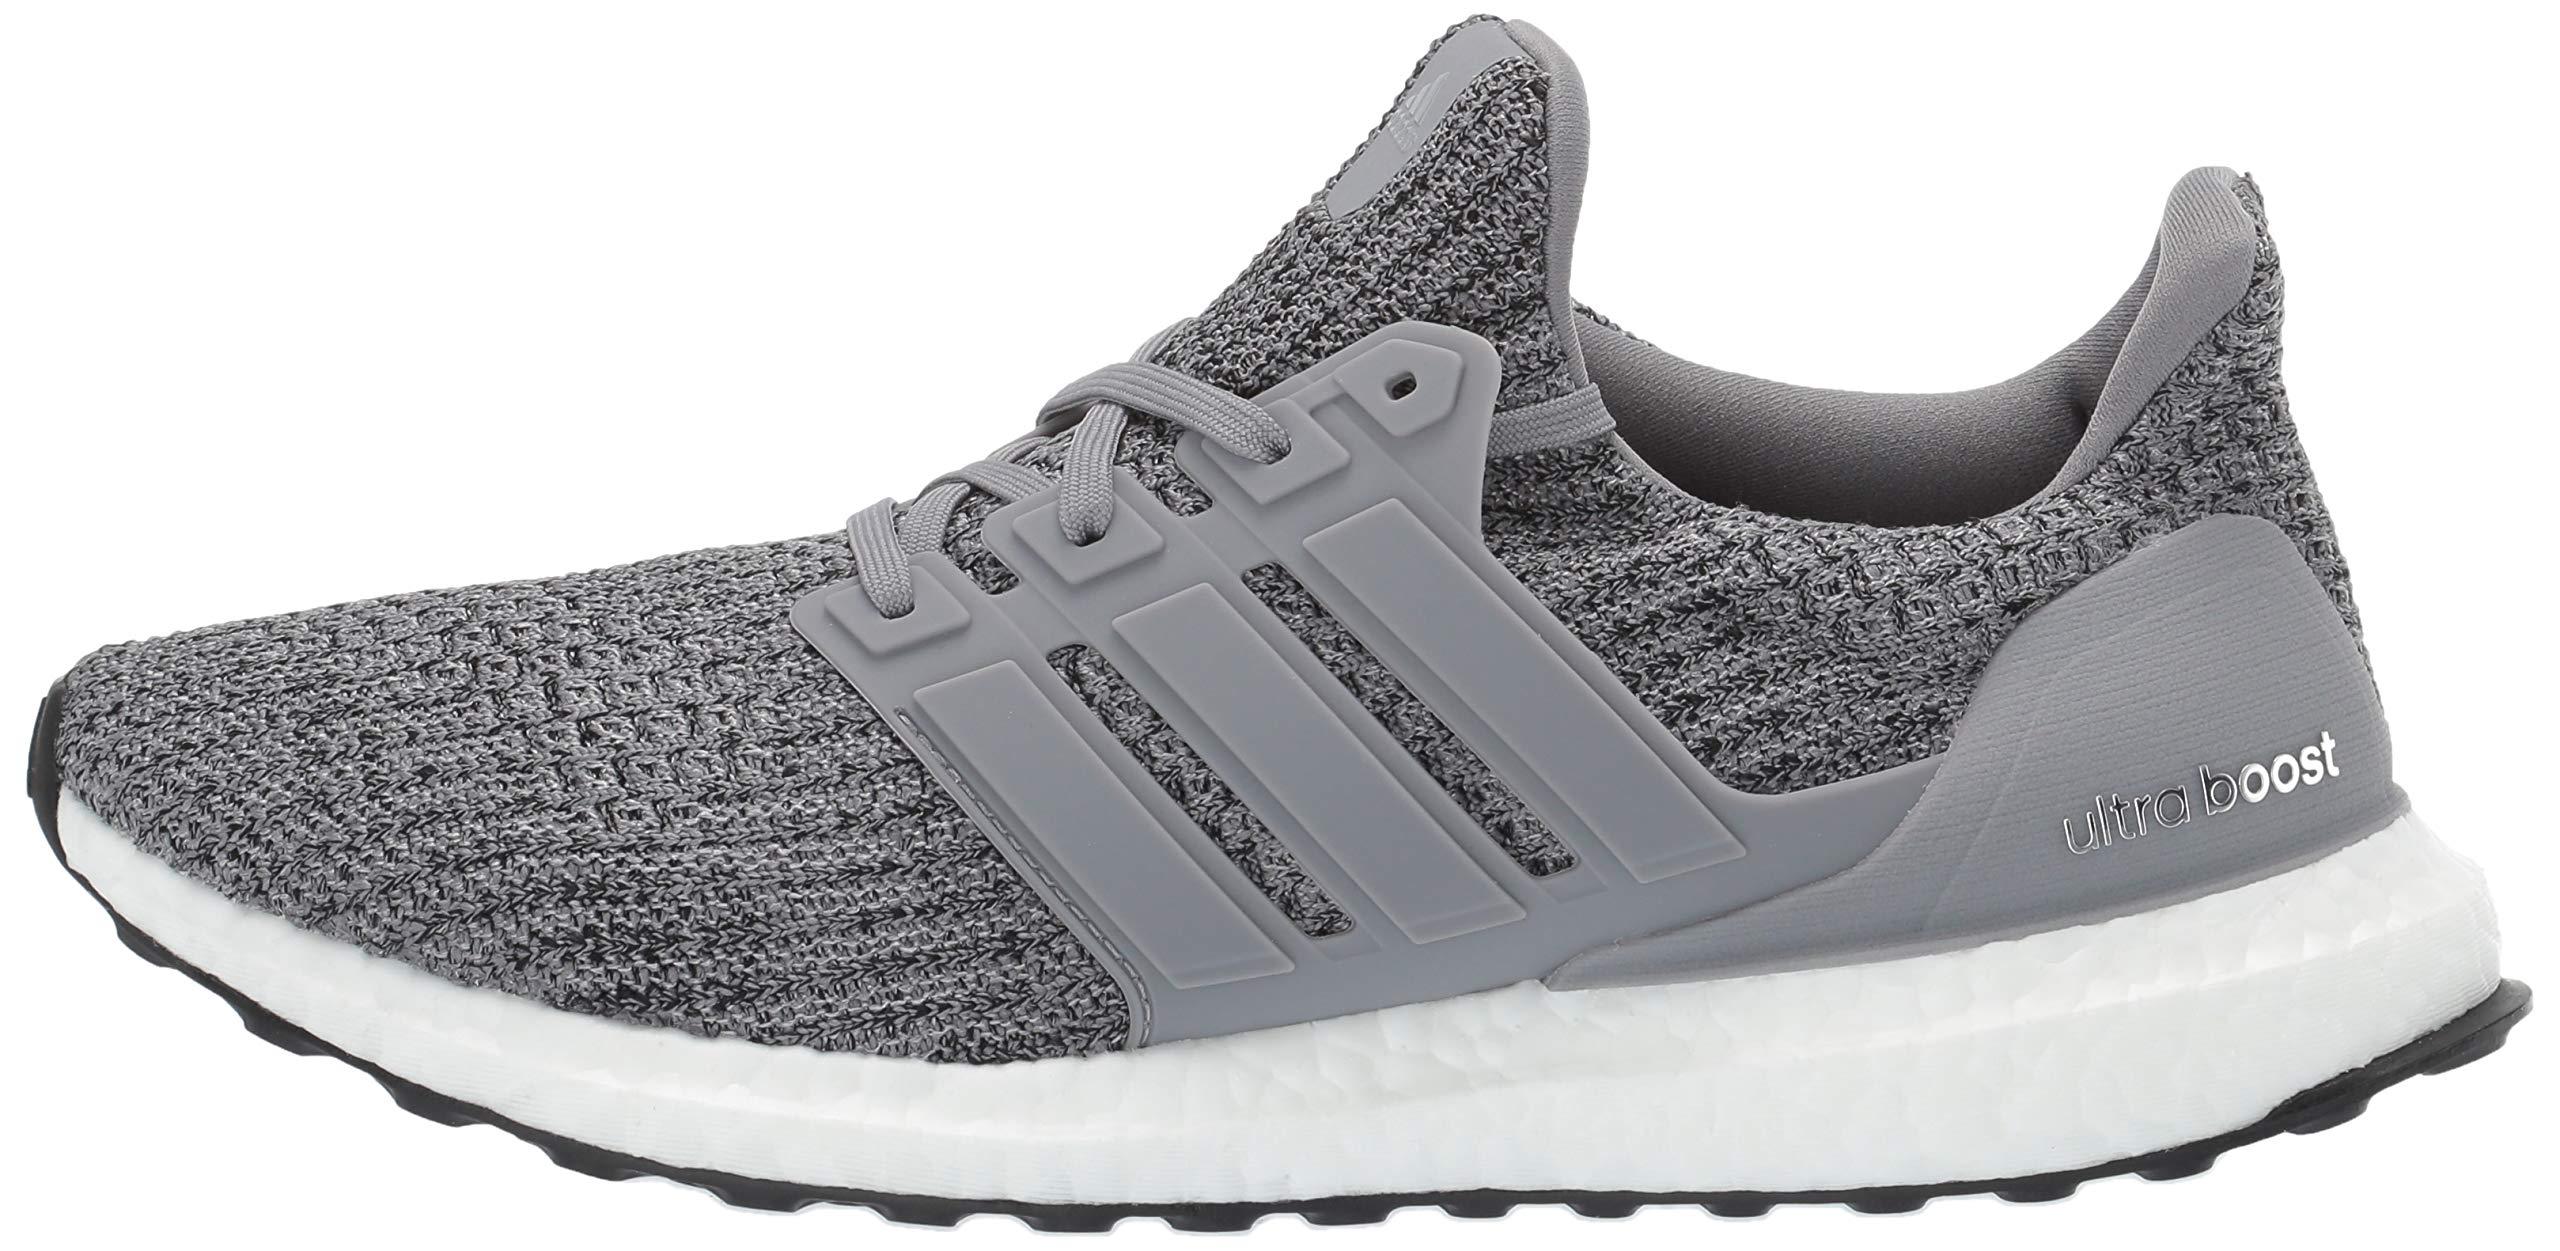 adidas Men's Ultraboost, Grey/Black, 4 M US by adidas (Image #5)